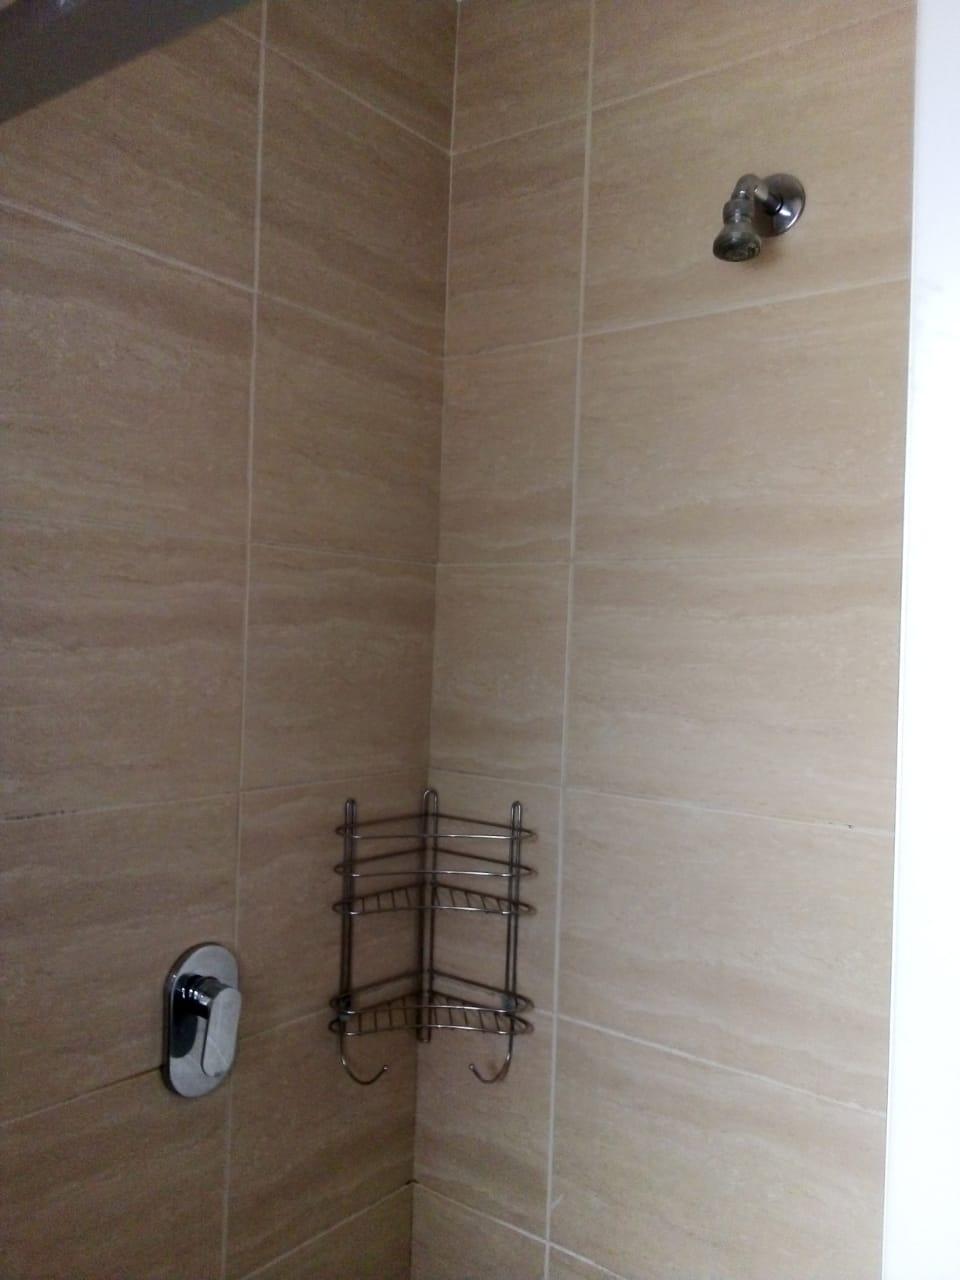 Neat 2-bedroom apartment in secure block with prepaid meter + LUG. Water incl. Imm